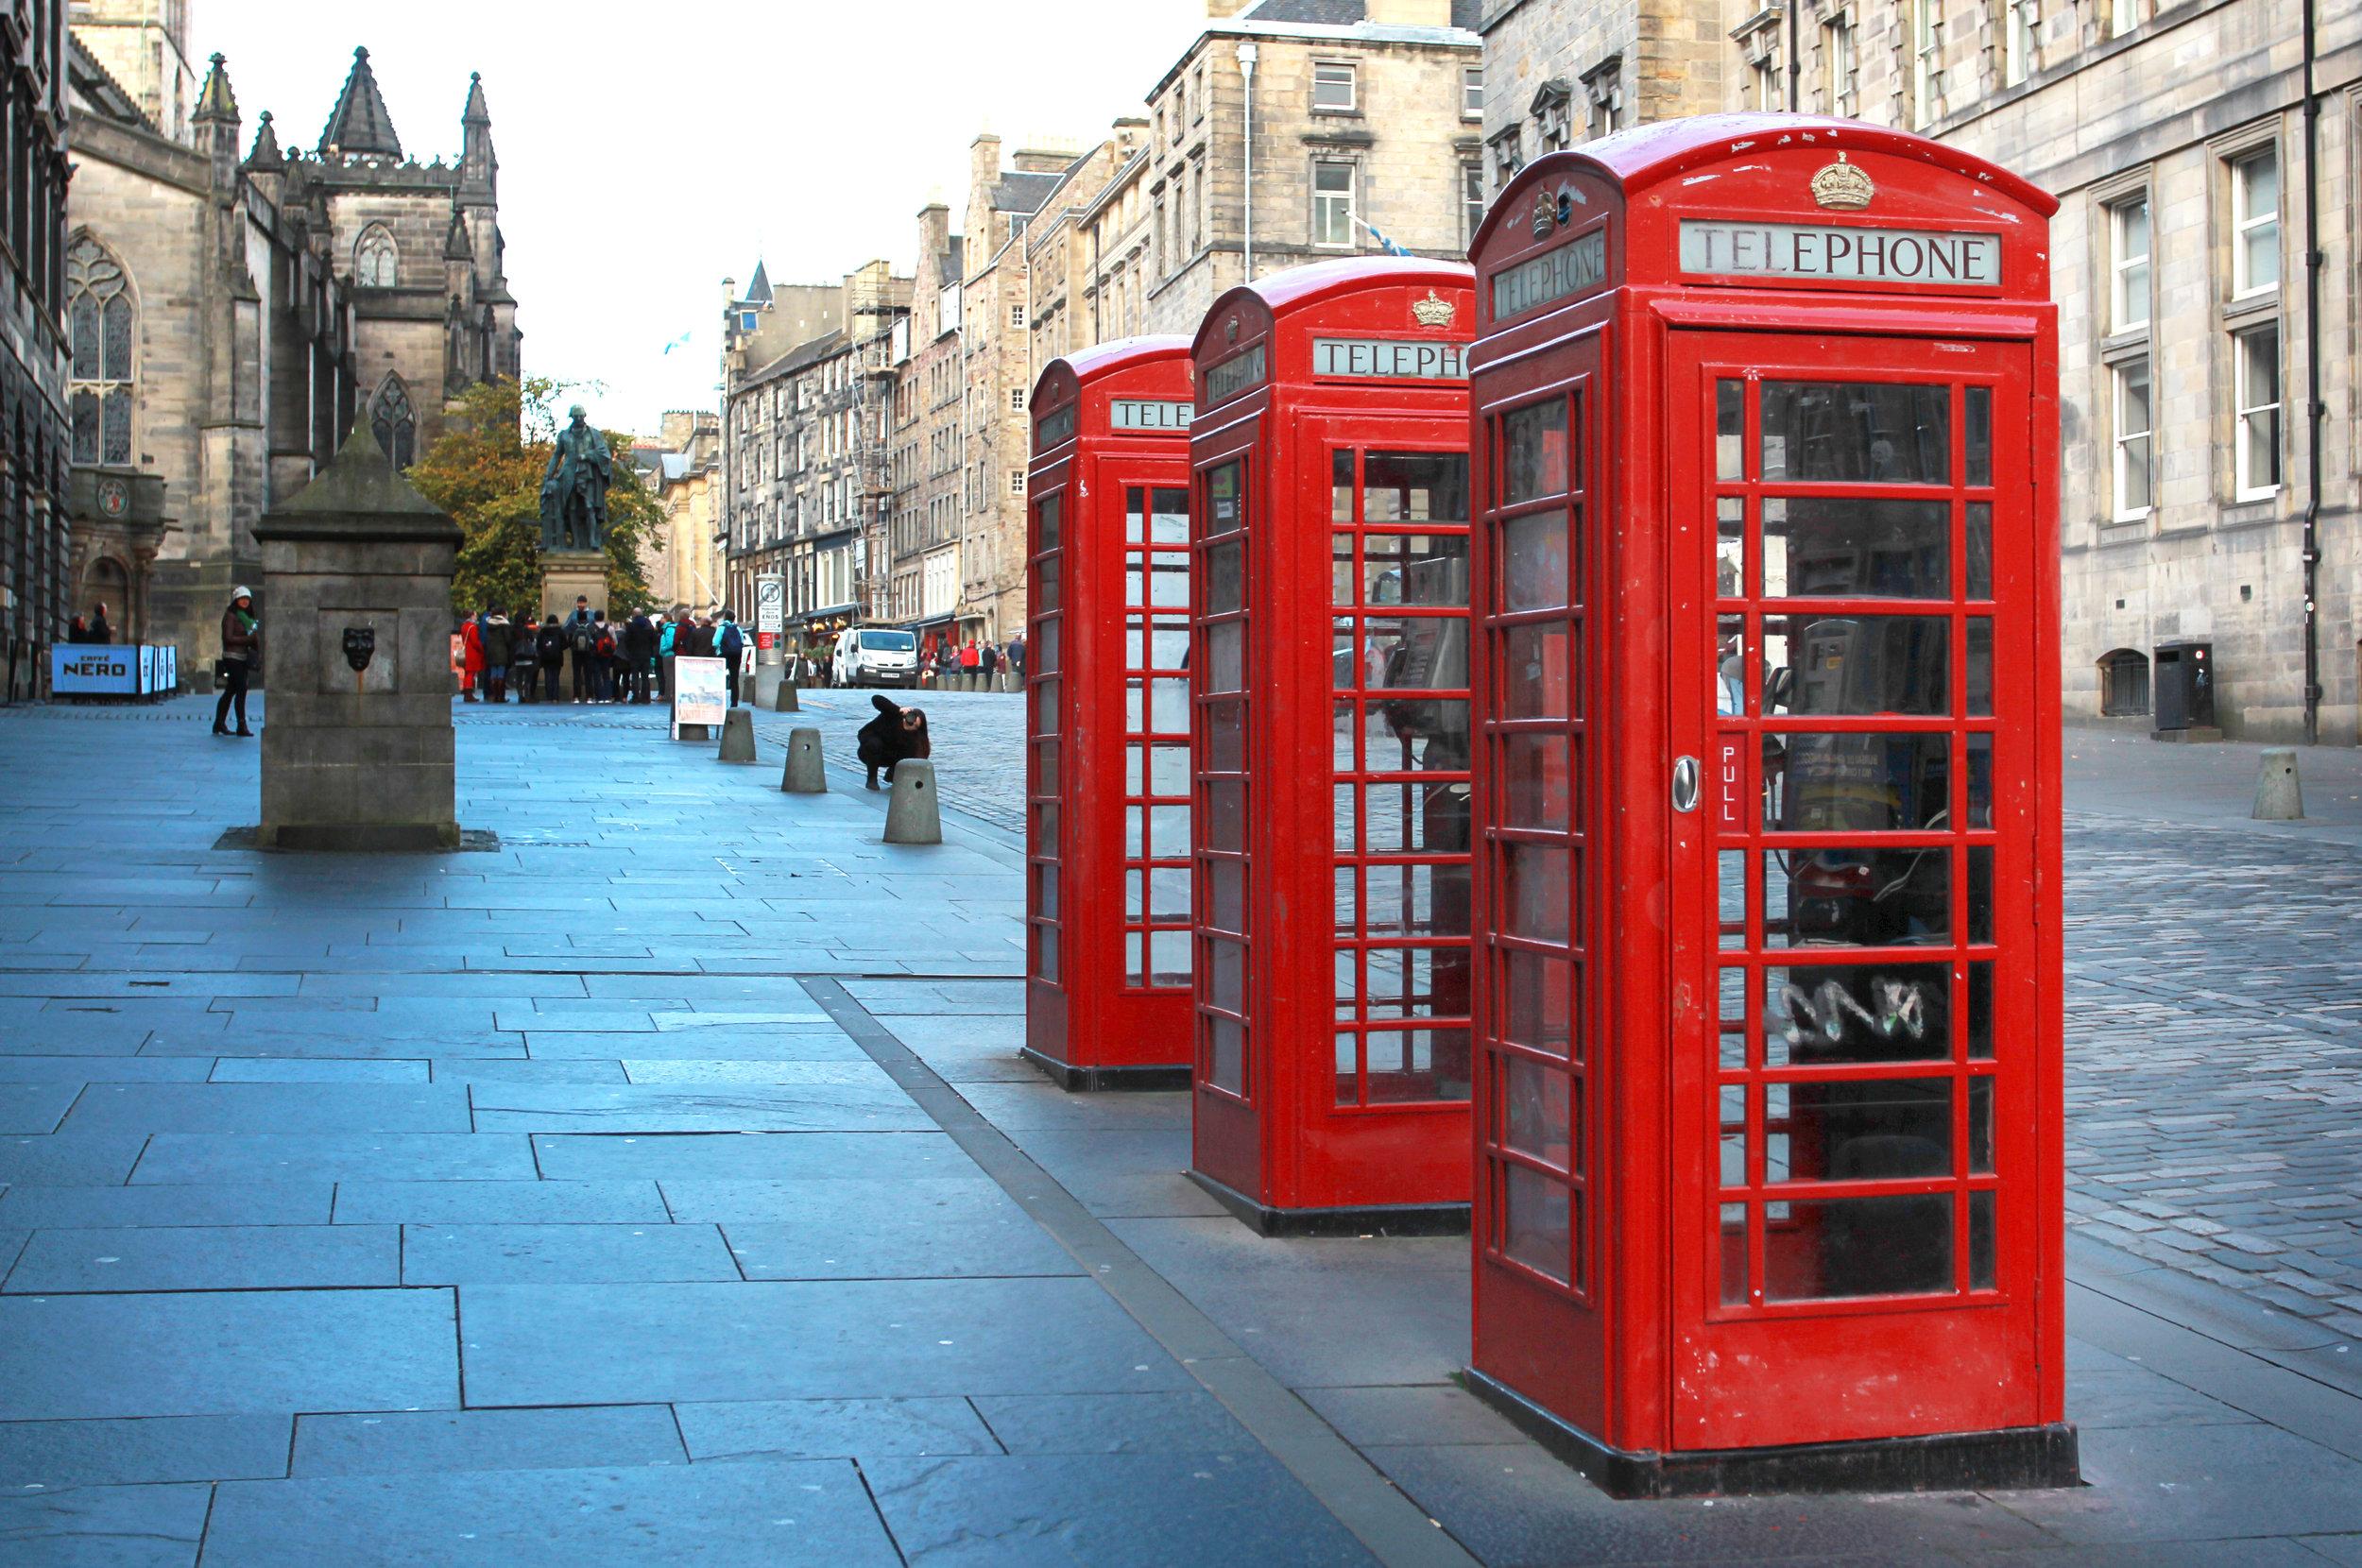 skottland_edinburgh_bigstock-Three-red-booths-on-a-row-in-t-55375646.jpg